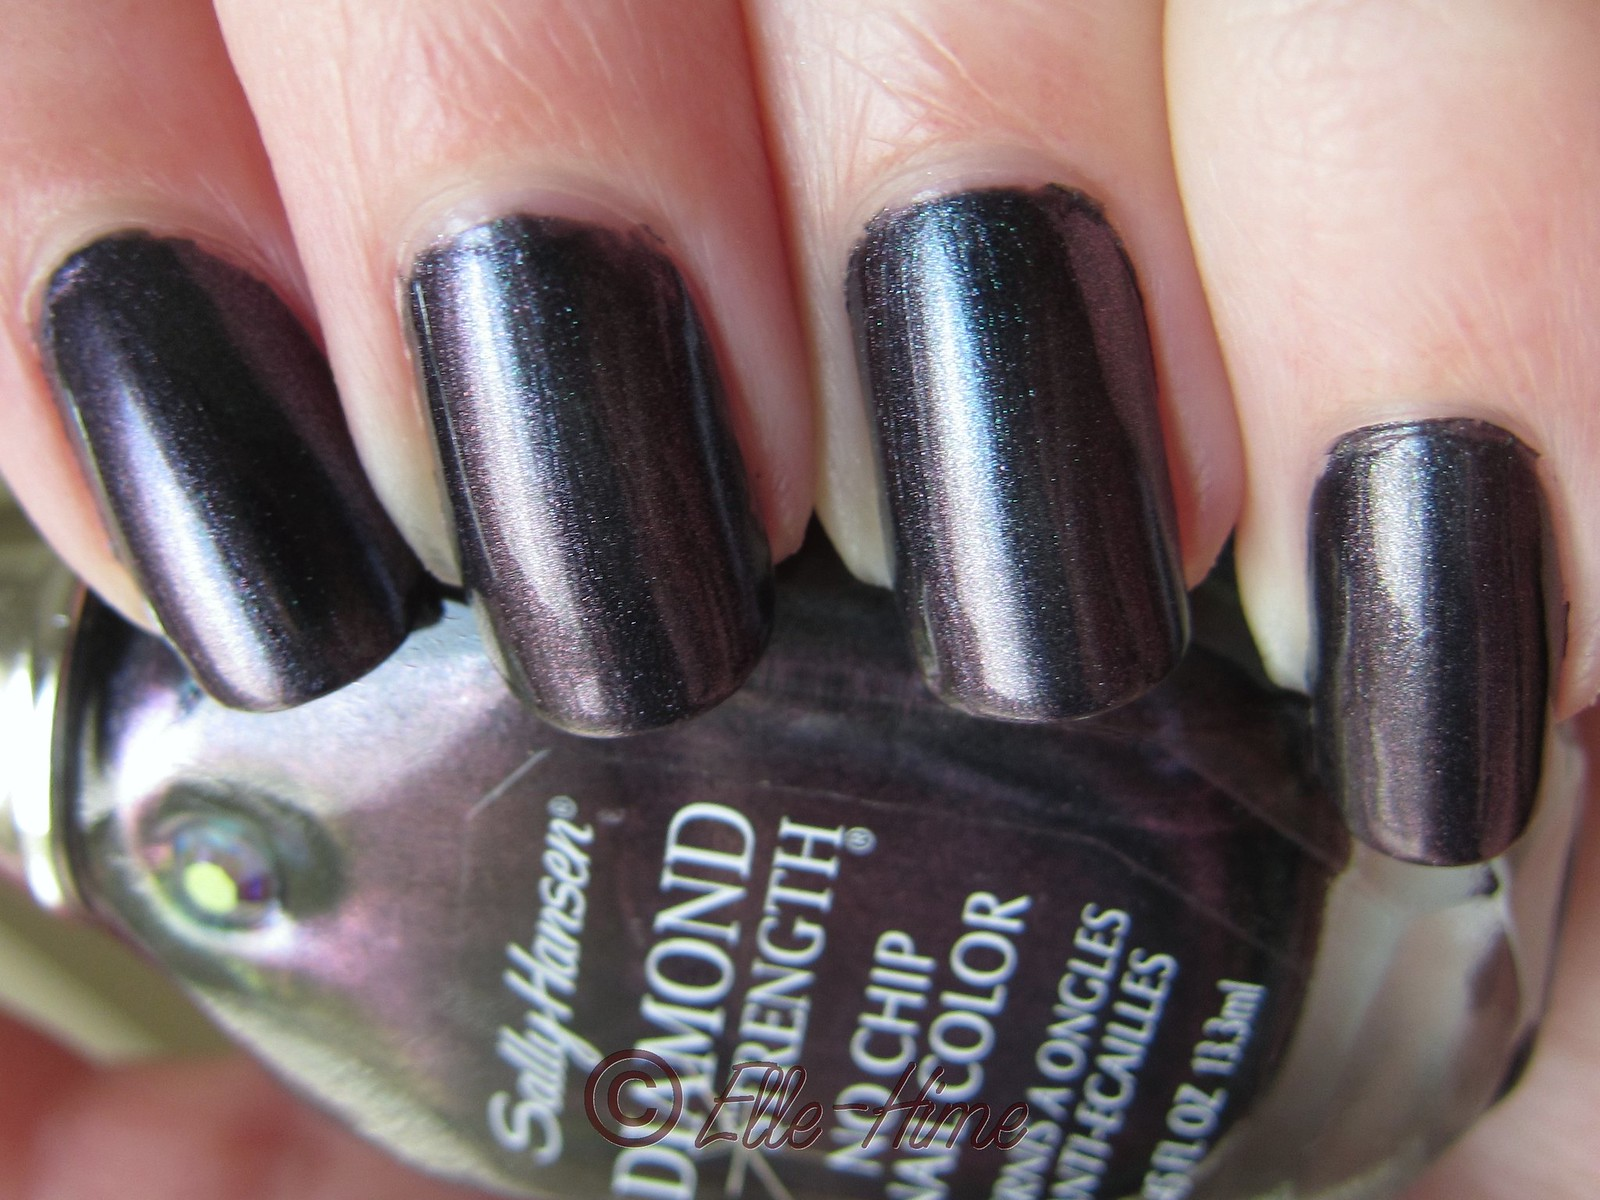 Princessly Polished: Sally Hansen: Black Tie - a special manicure